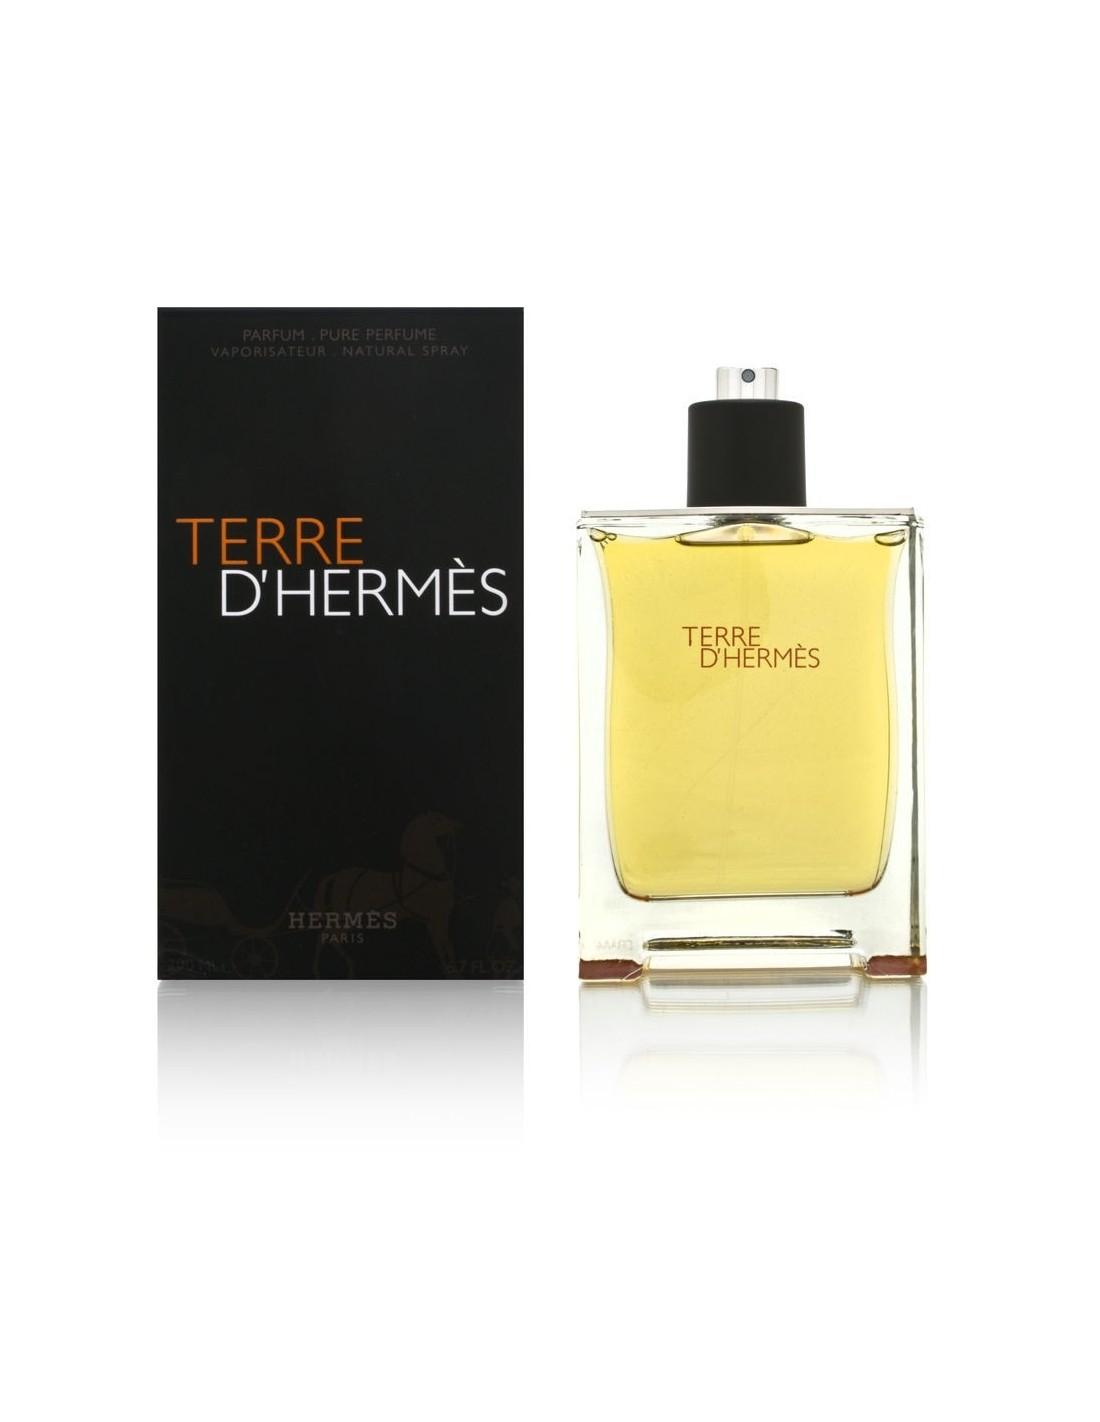 hermes terre d 39 hermes pure perfume 200 ml spray azzurra. Black Bedroom Furniture Sets. Home Design Ideas